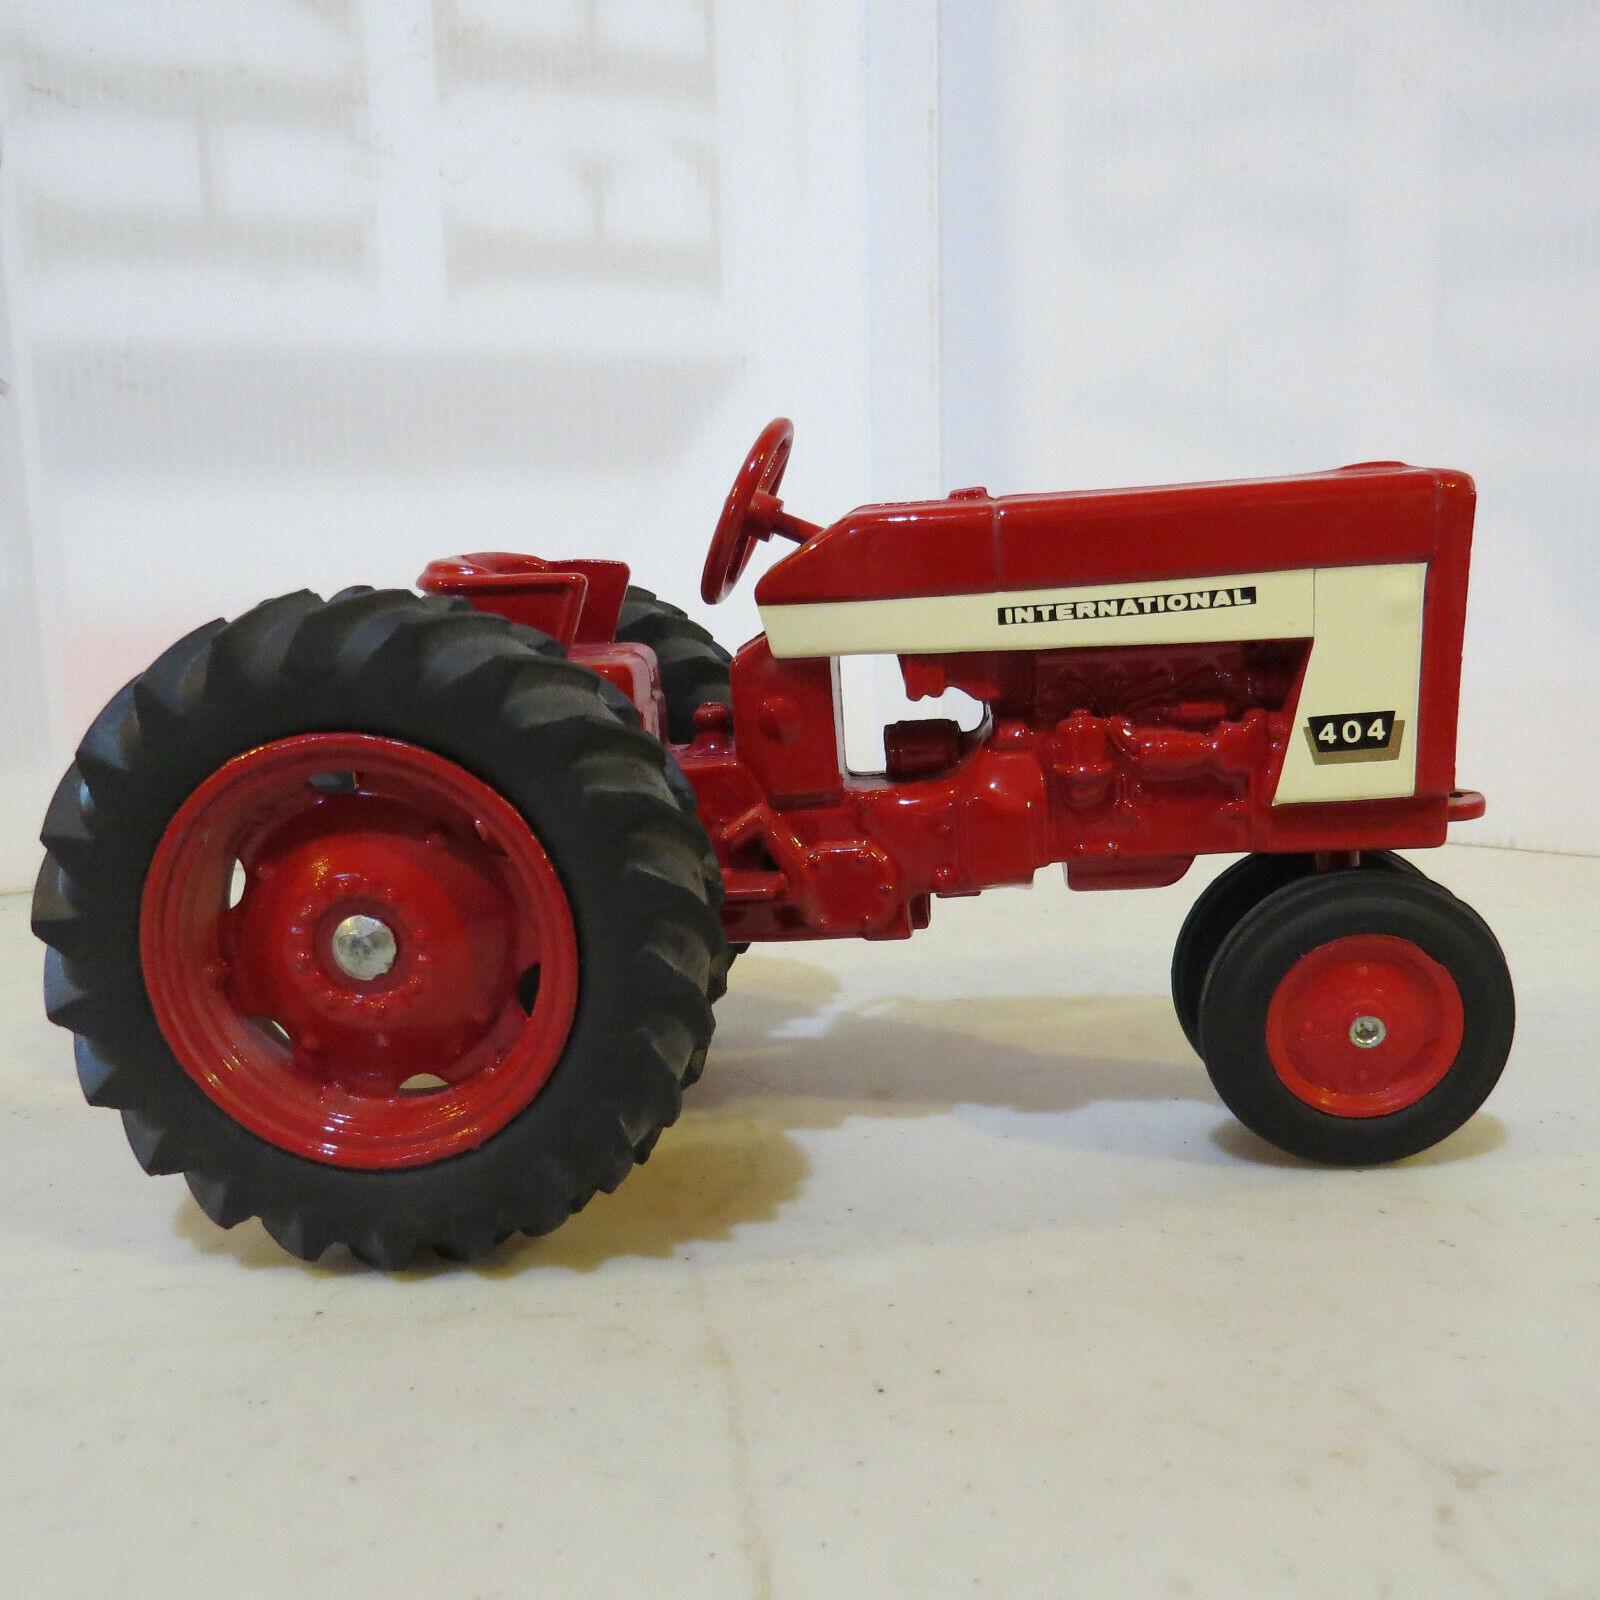 Ertl Ngosiw3556 International Rare Nf Harvester 404 Tracteur Ih487 v0wOy8nPmN